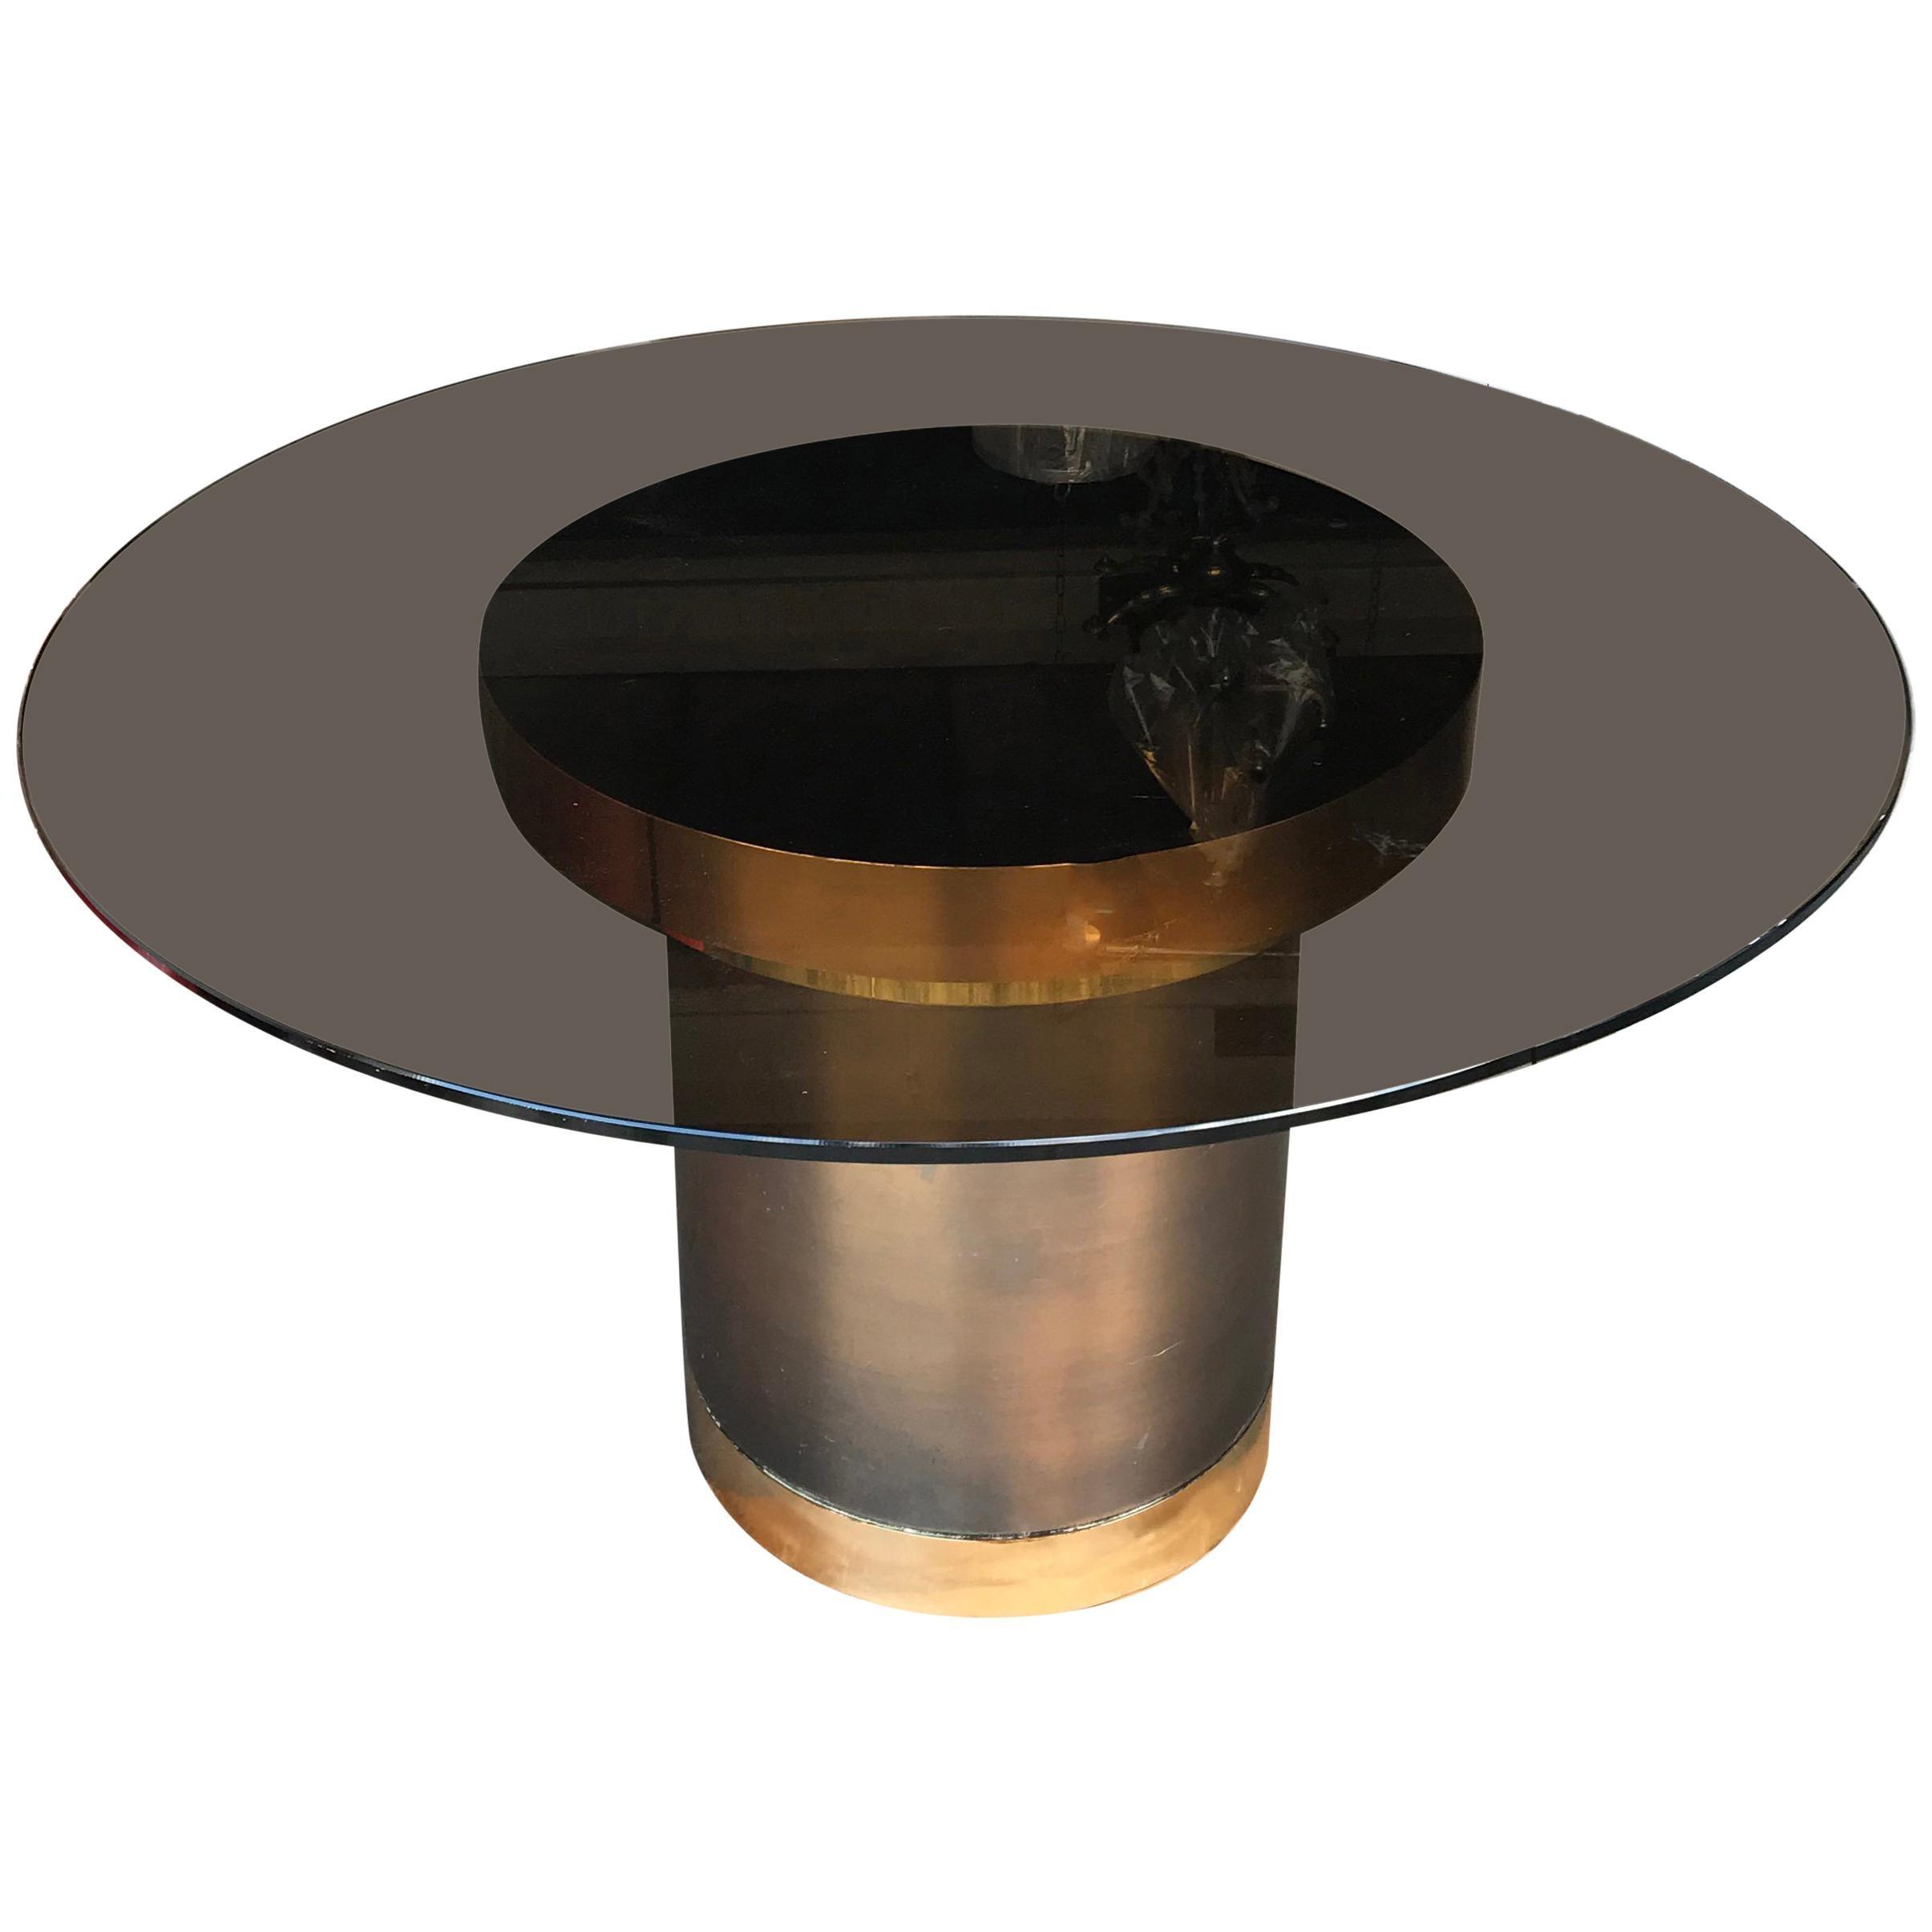 Karl Springer Style Round Table